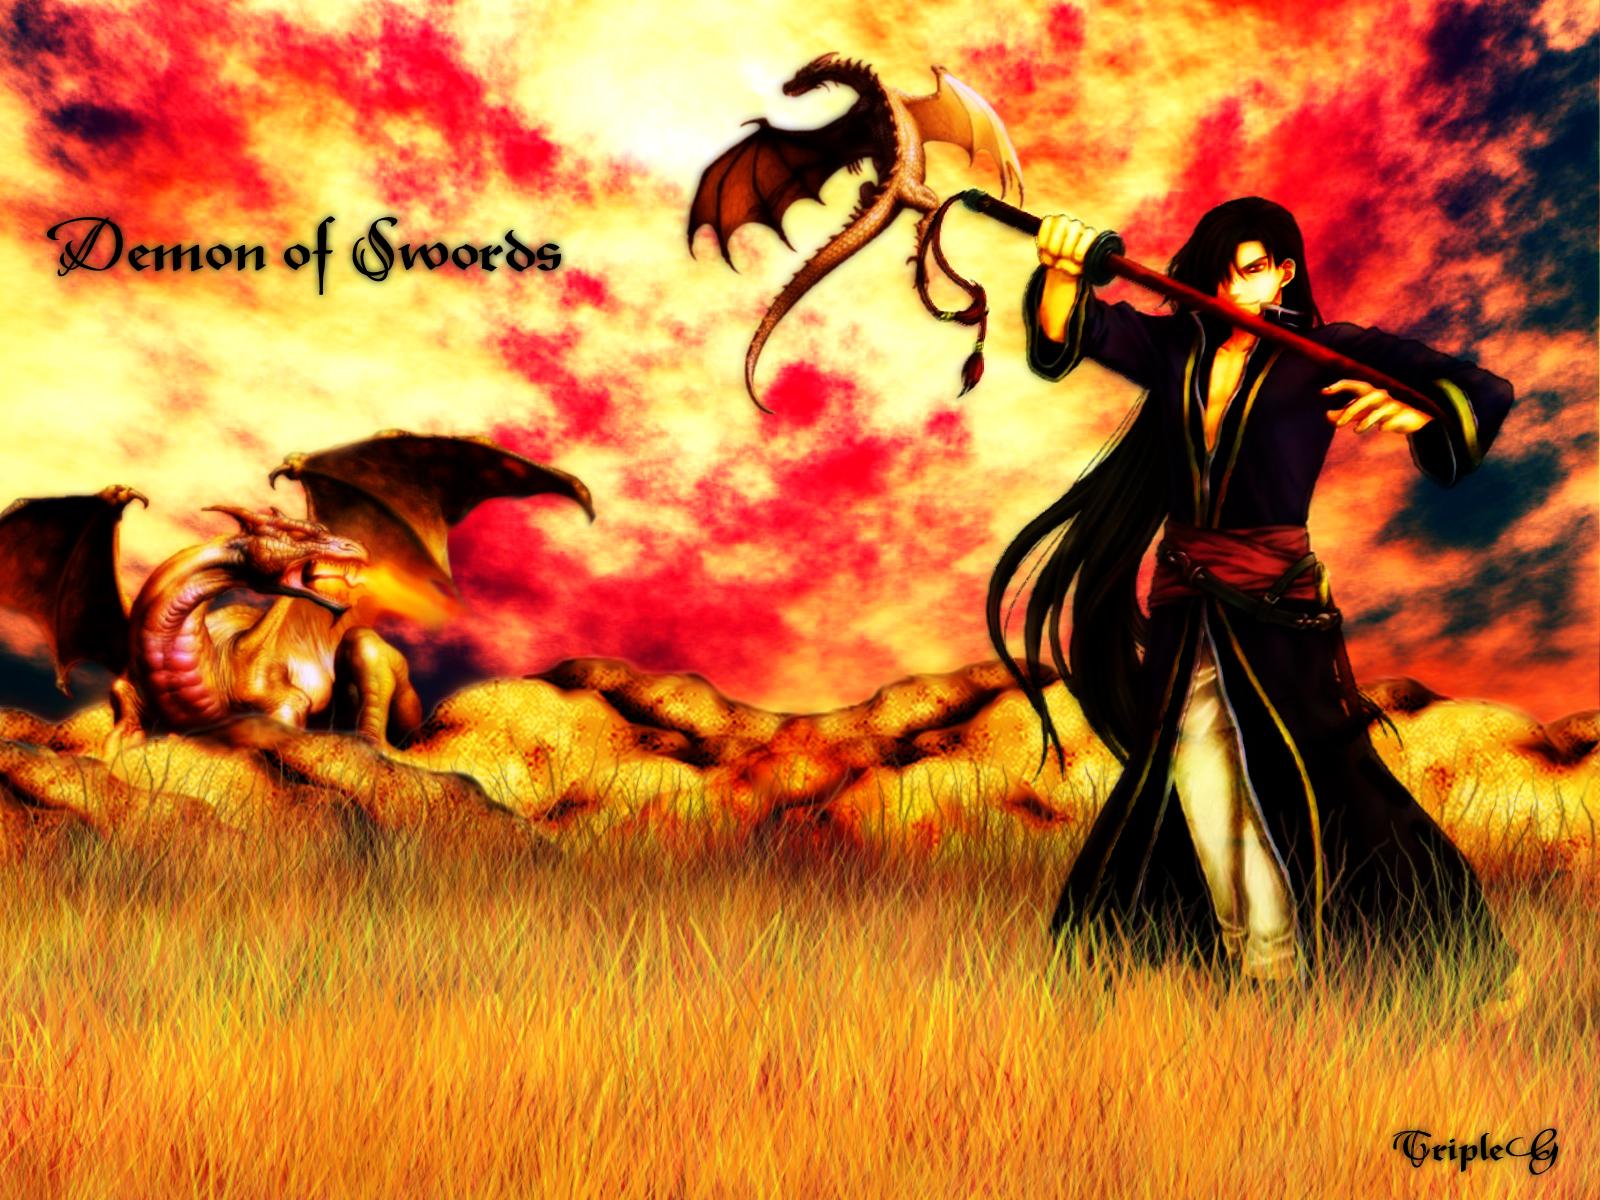 brown_hair dragon fire fire_emblem karel_(fire_emblem) long_hair sword tripleg weapon wings